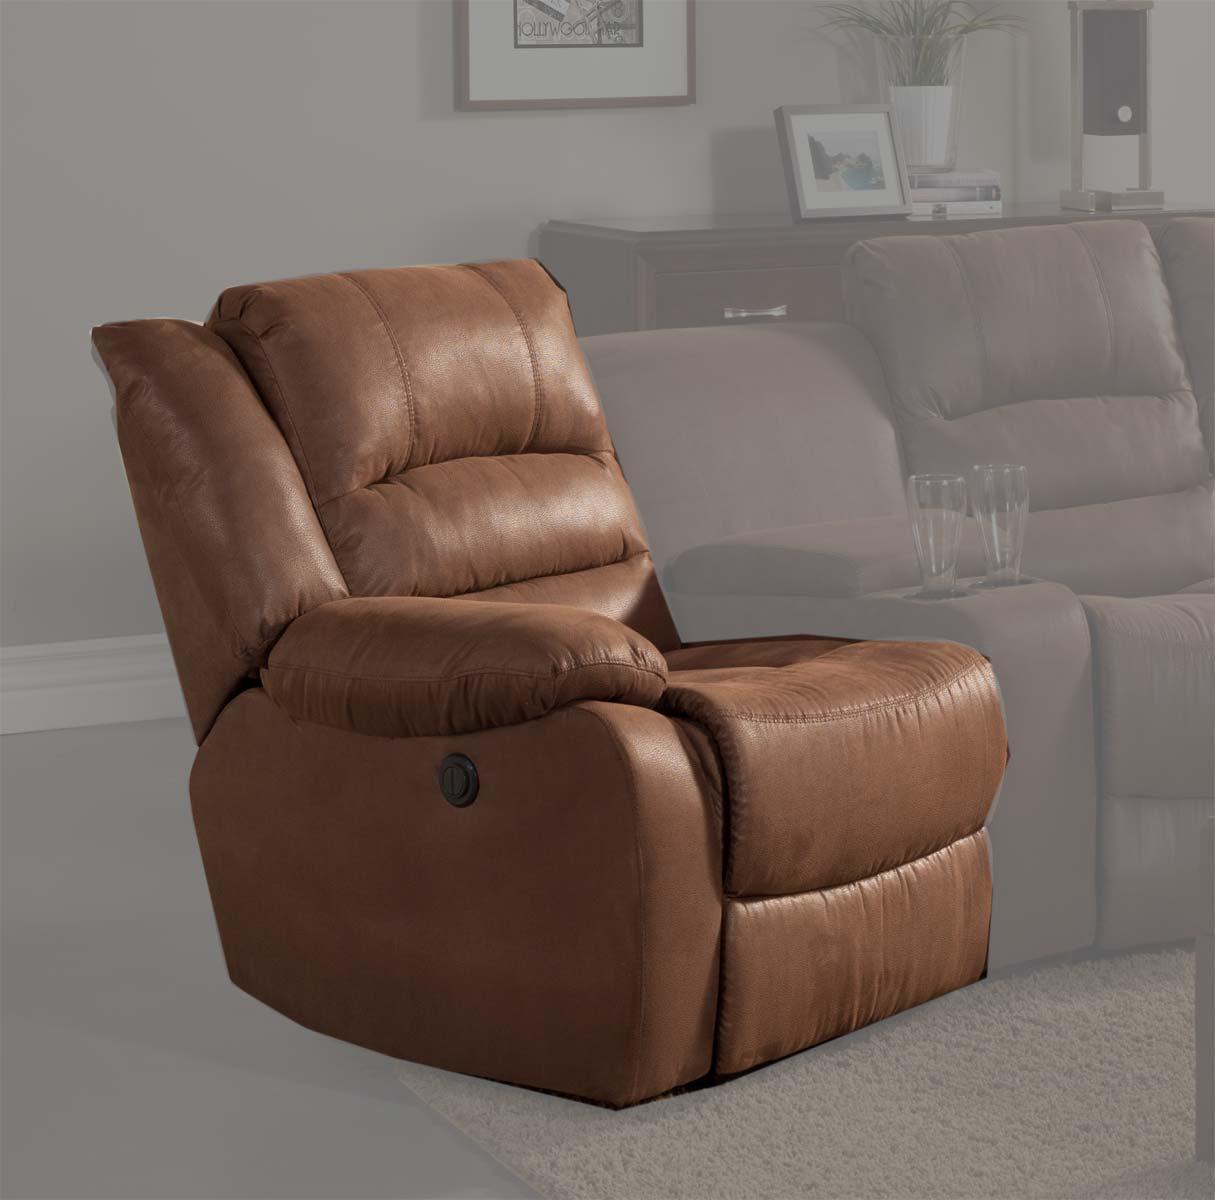 Homelegance Tucker LSF Power Recliner Chair - Brown - Bomber Jacket Microfiber